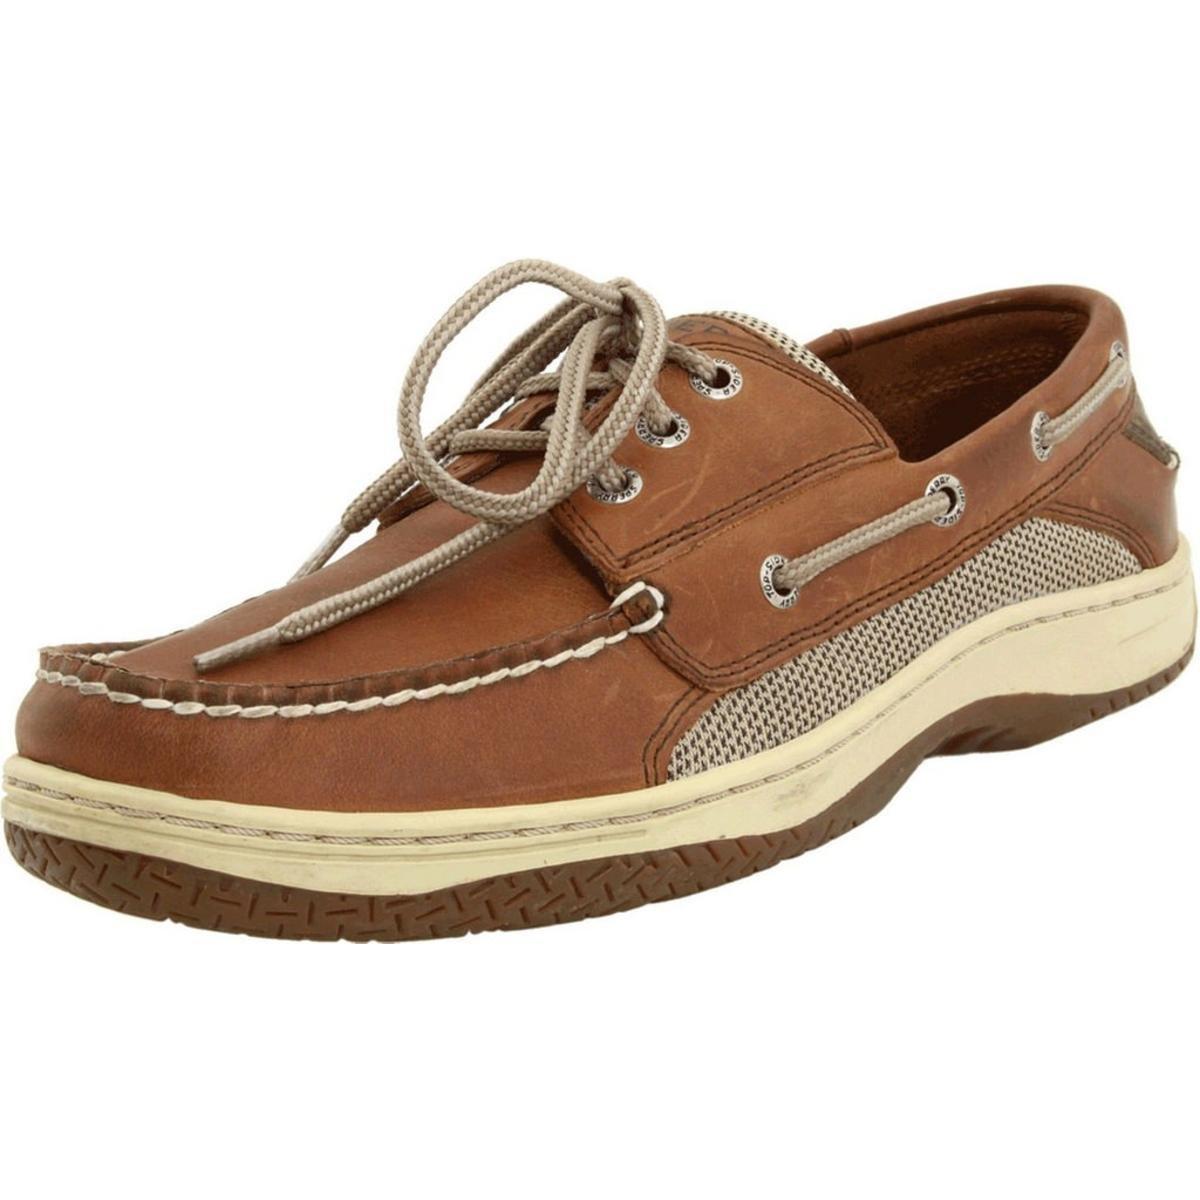 Sperry Top-Sider Men's Billfish 3-Eye Boat Shoe, Dark Tan, 12 M US